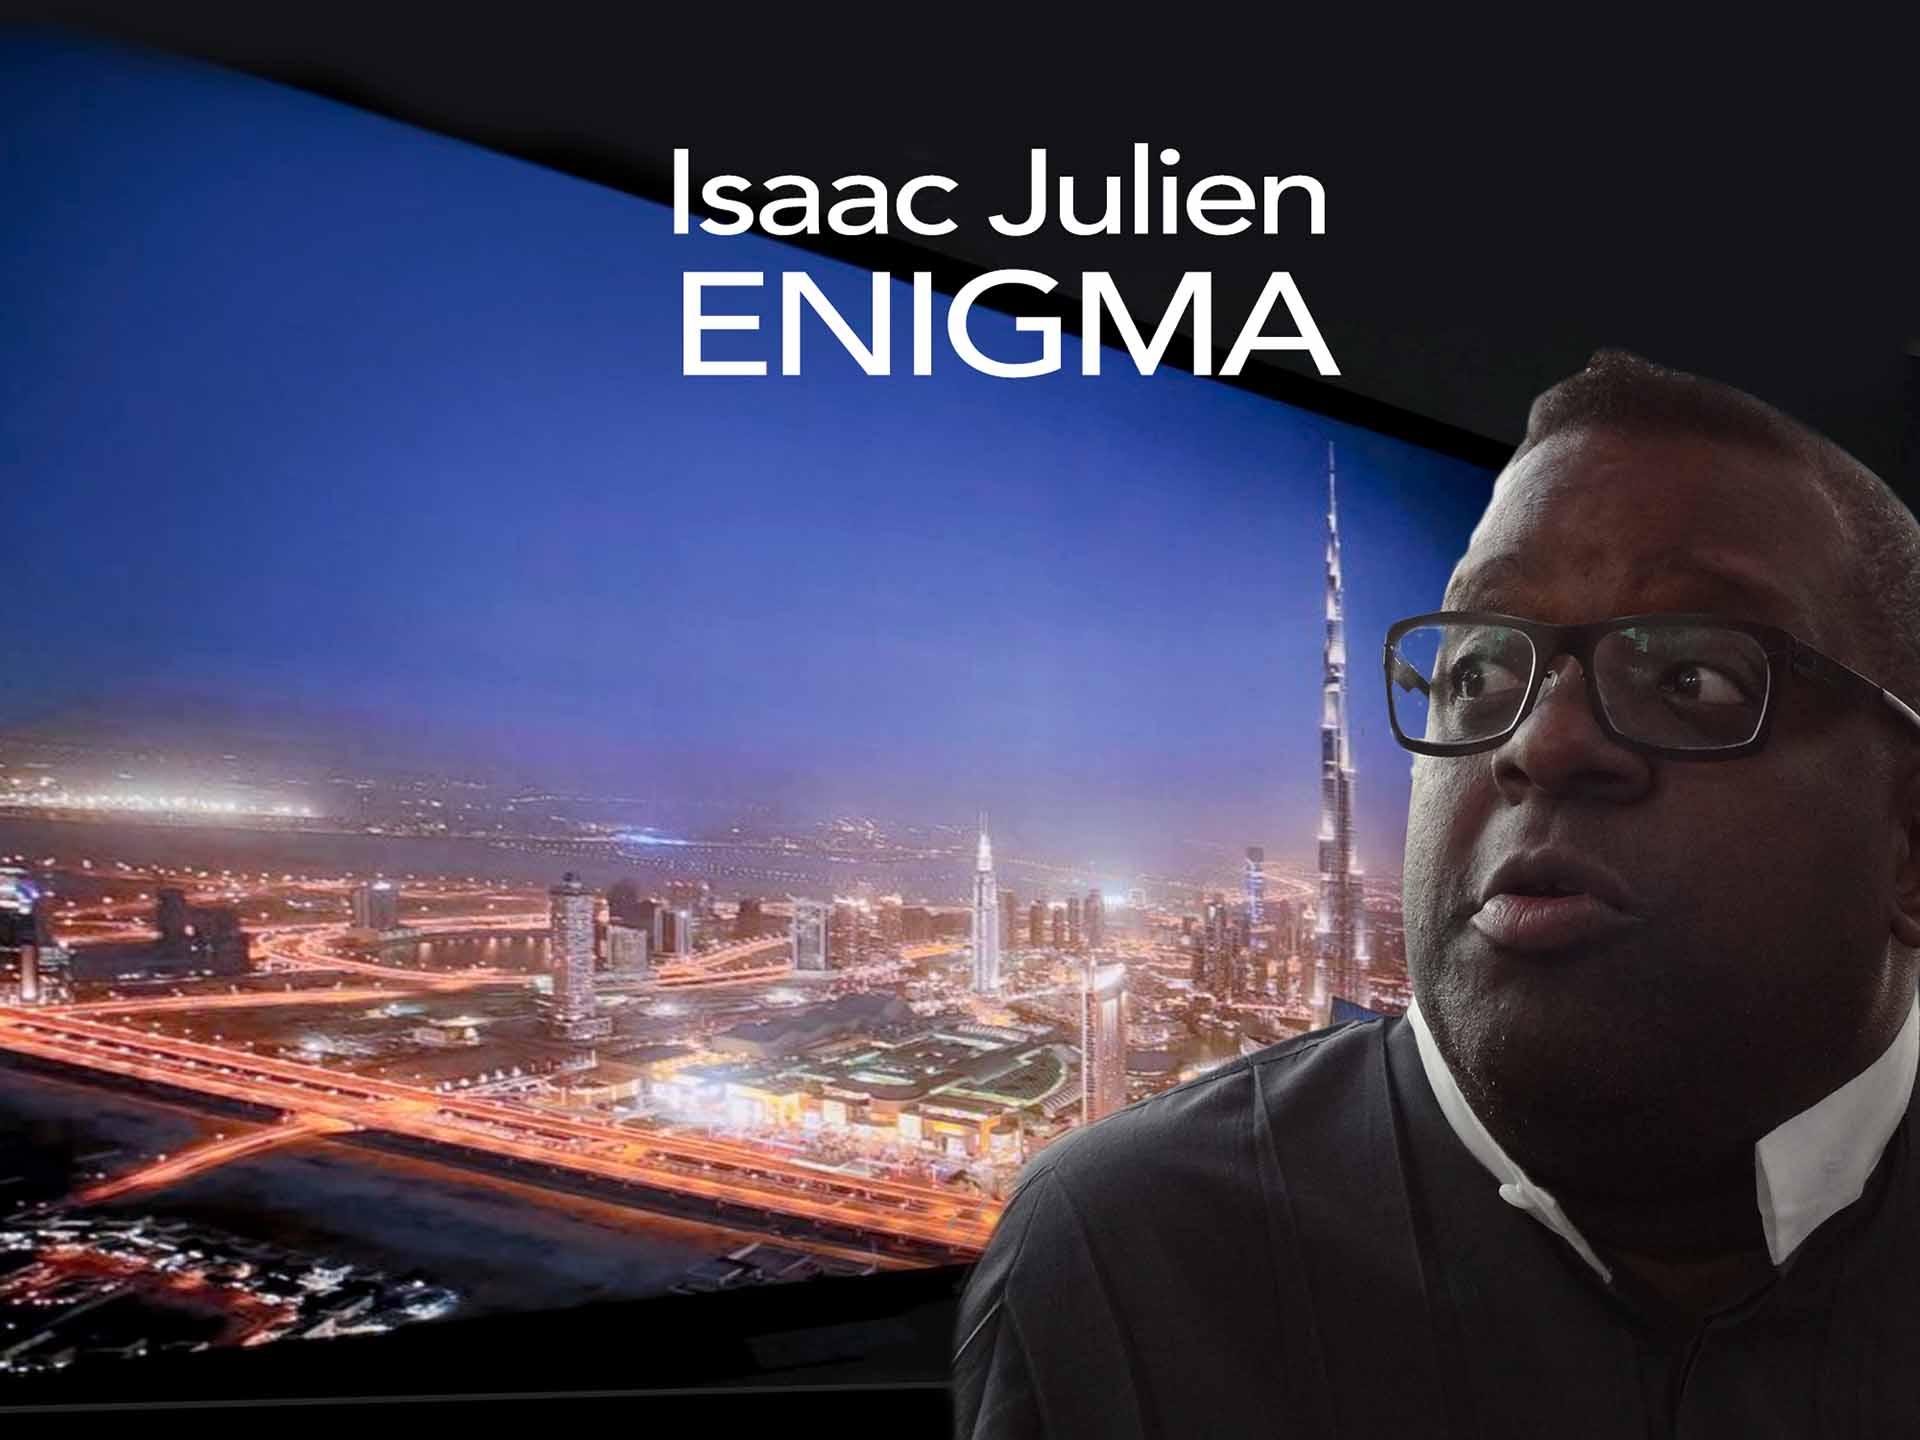 Isaac_Julien_Enigma_2_1920x1440